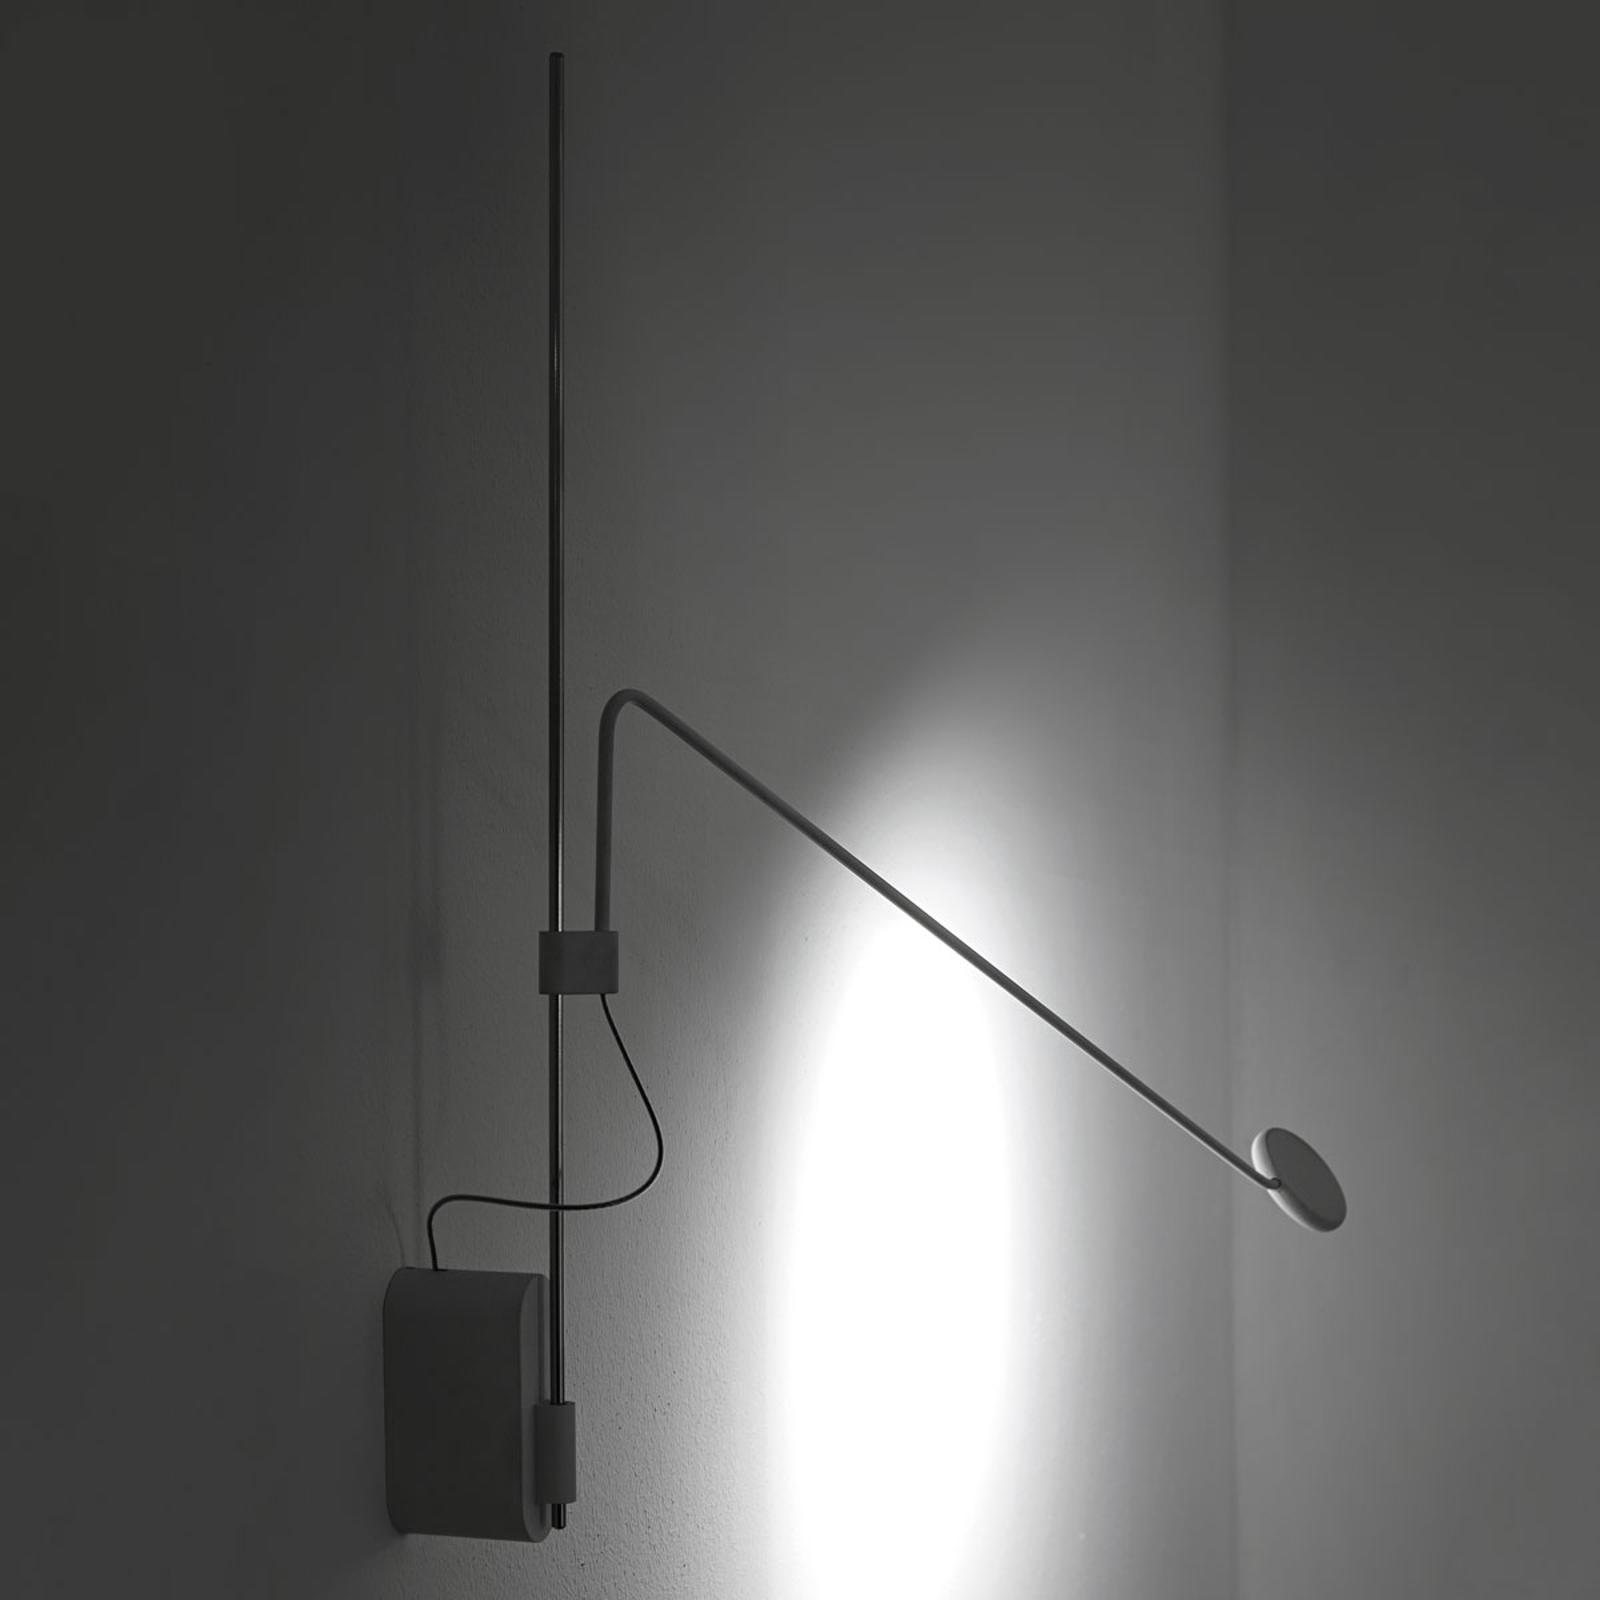 ICONE Tecla - höhenverstellbare LED-Wandleuchte